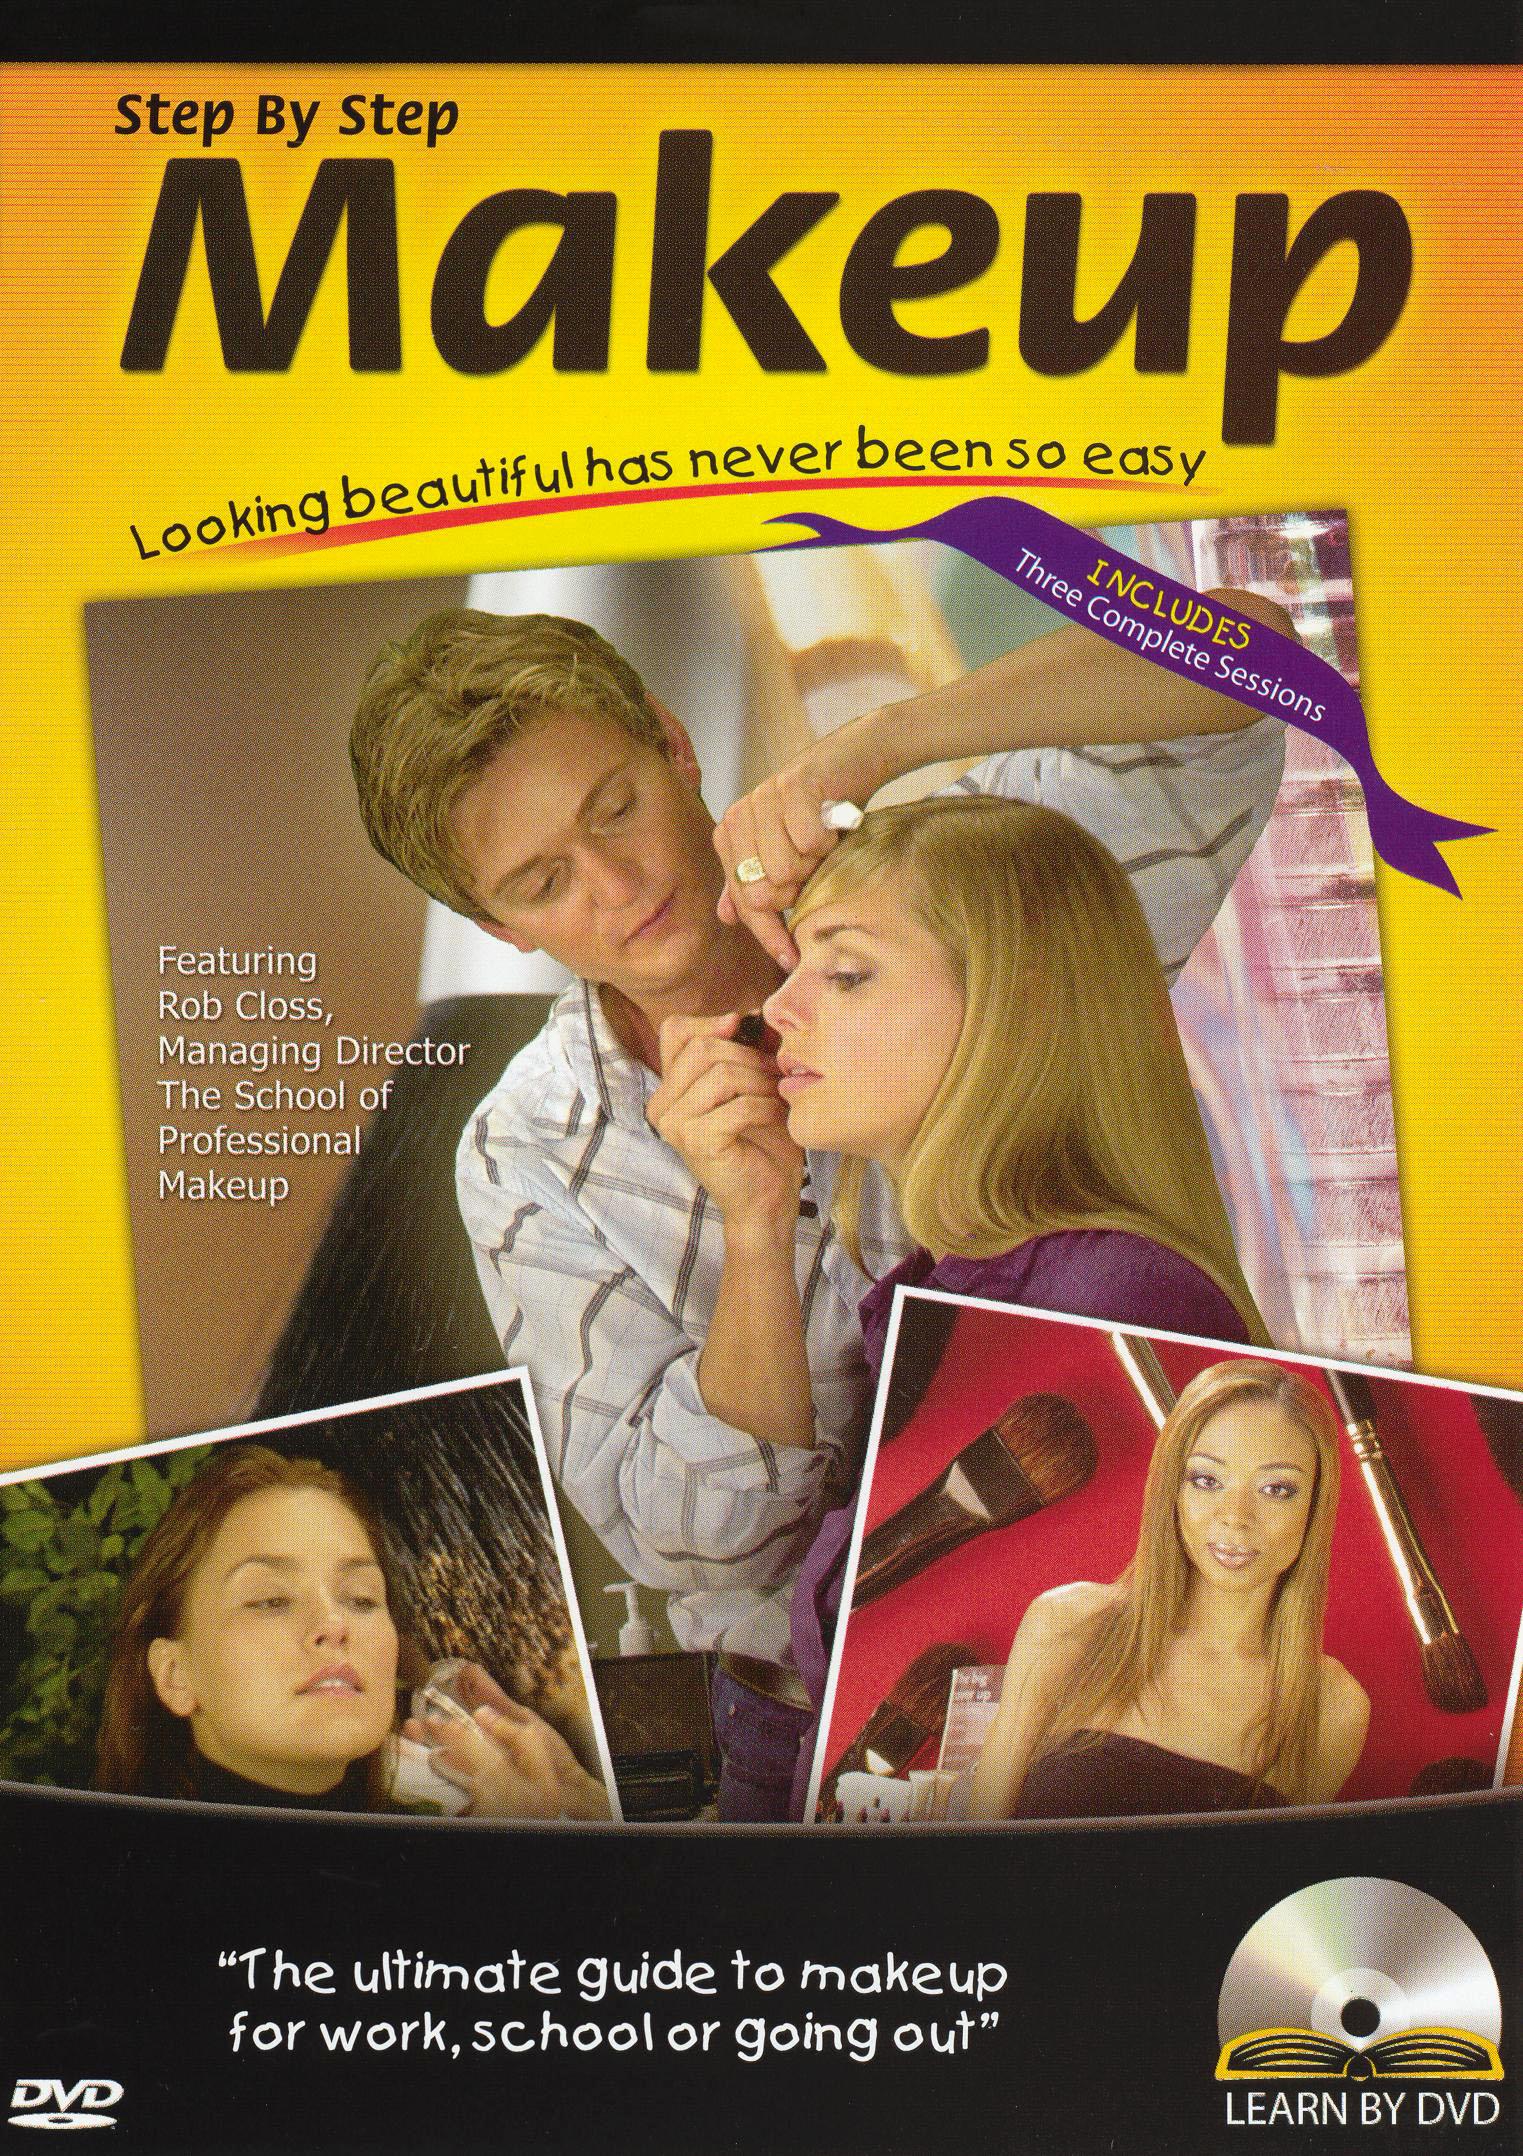 Step by Step: Makeup